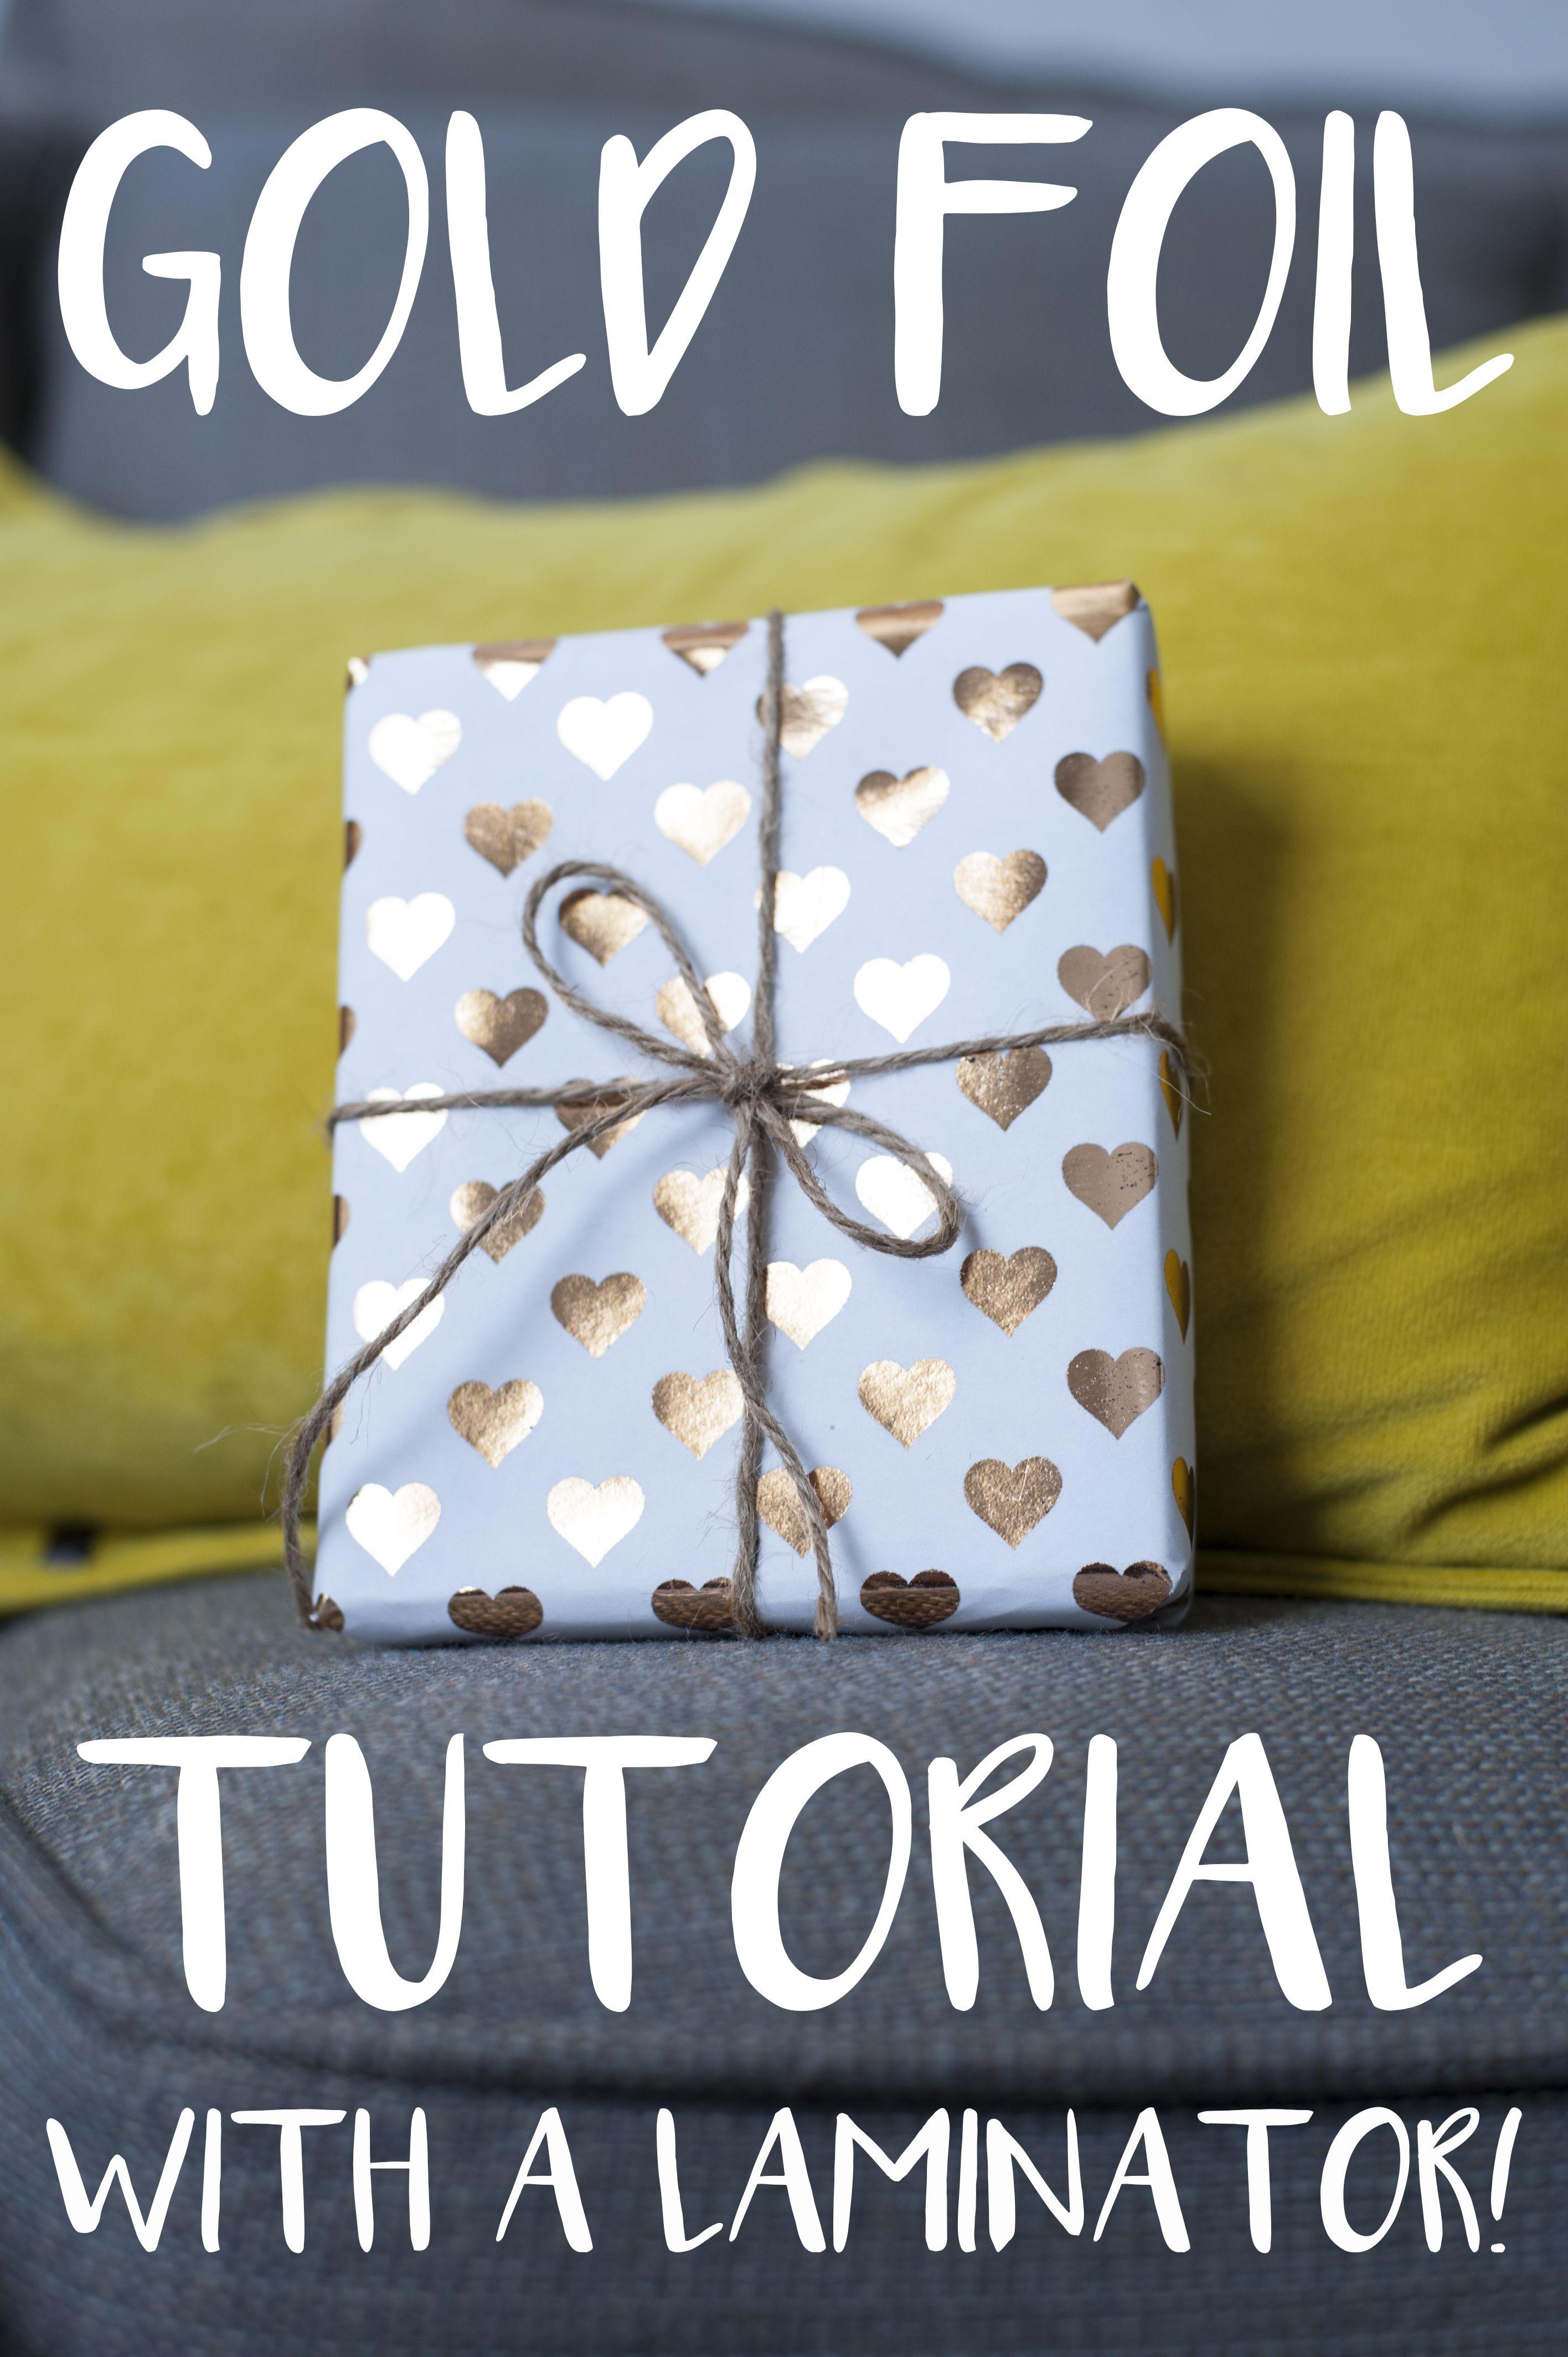 gold foil tutorial with a laminator GENIUS